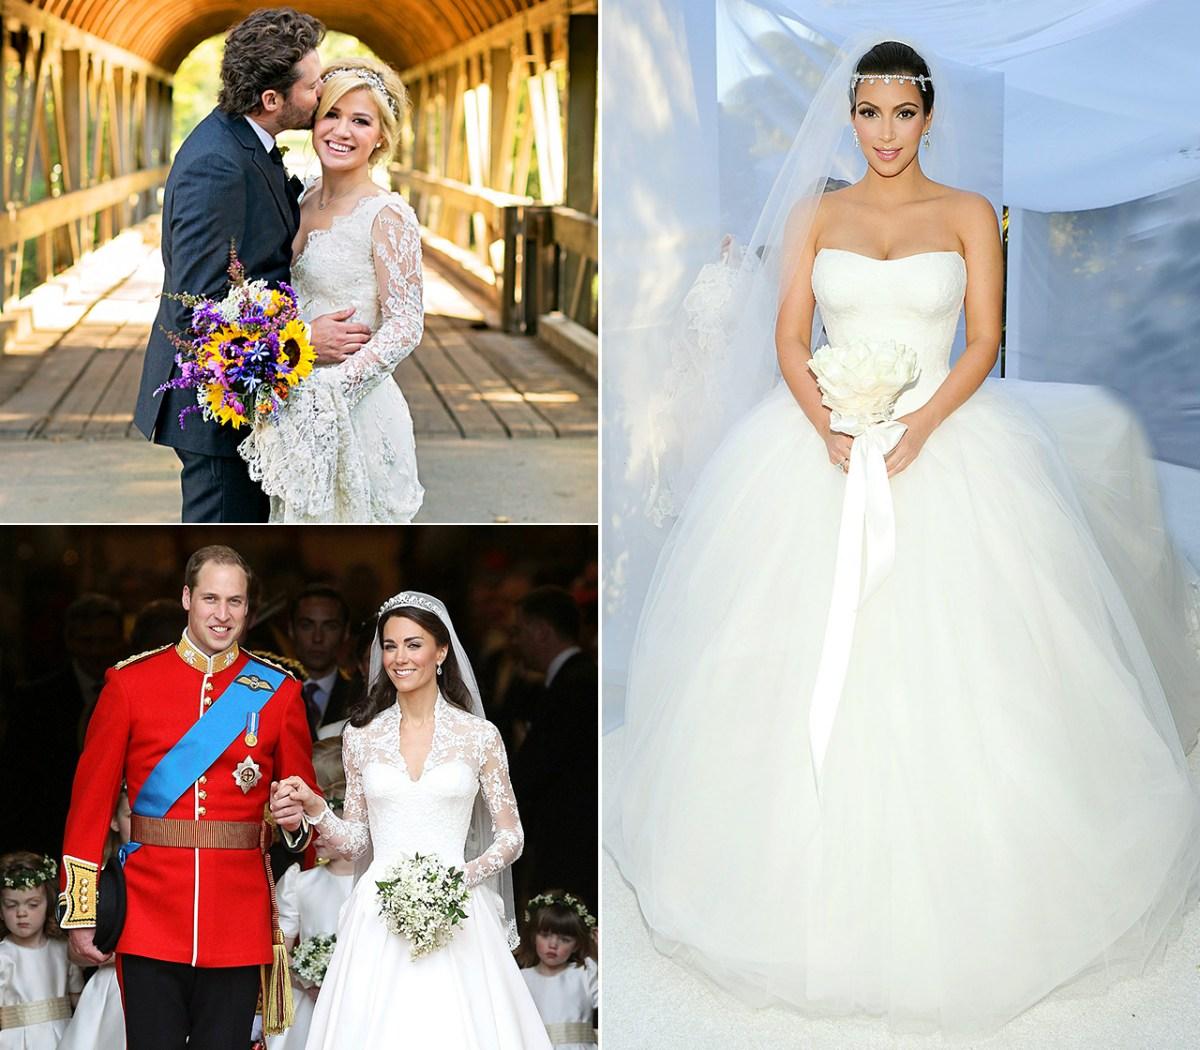 Black wedding dresses history of soccer